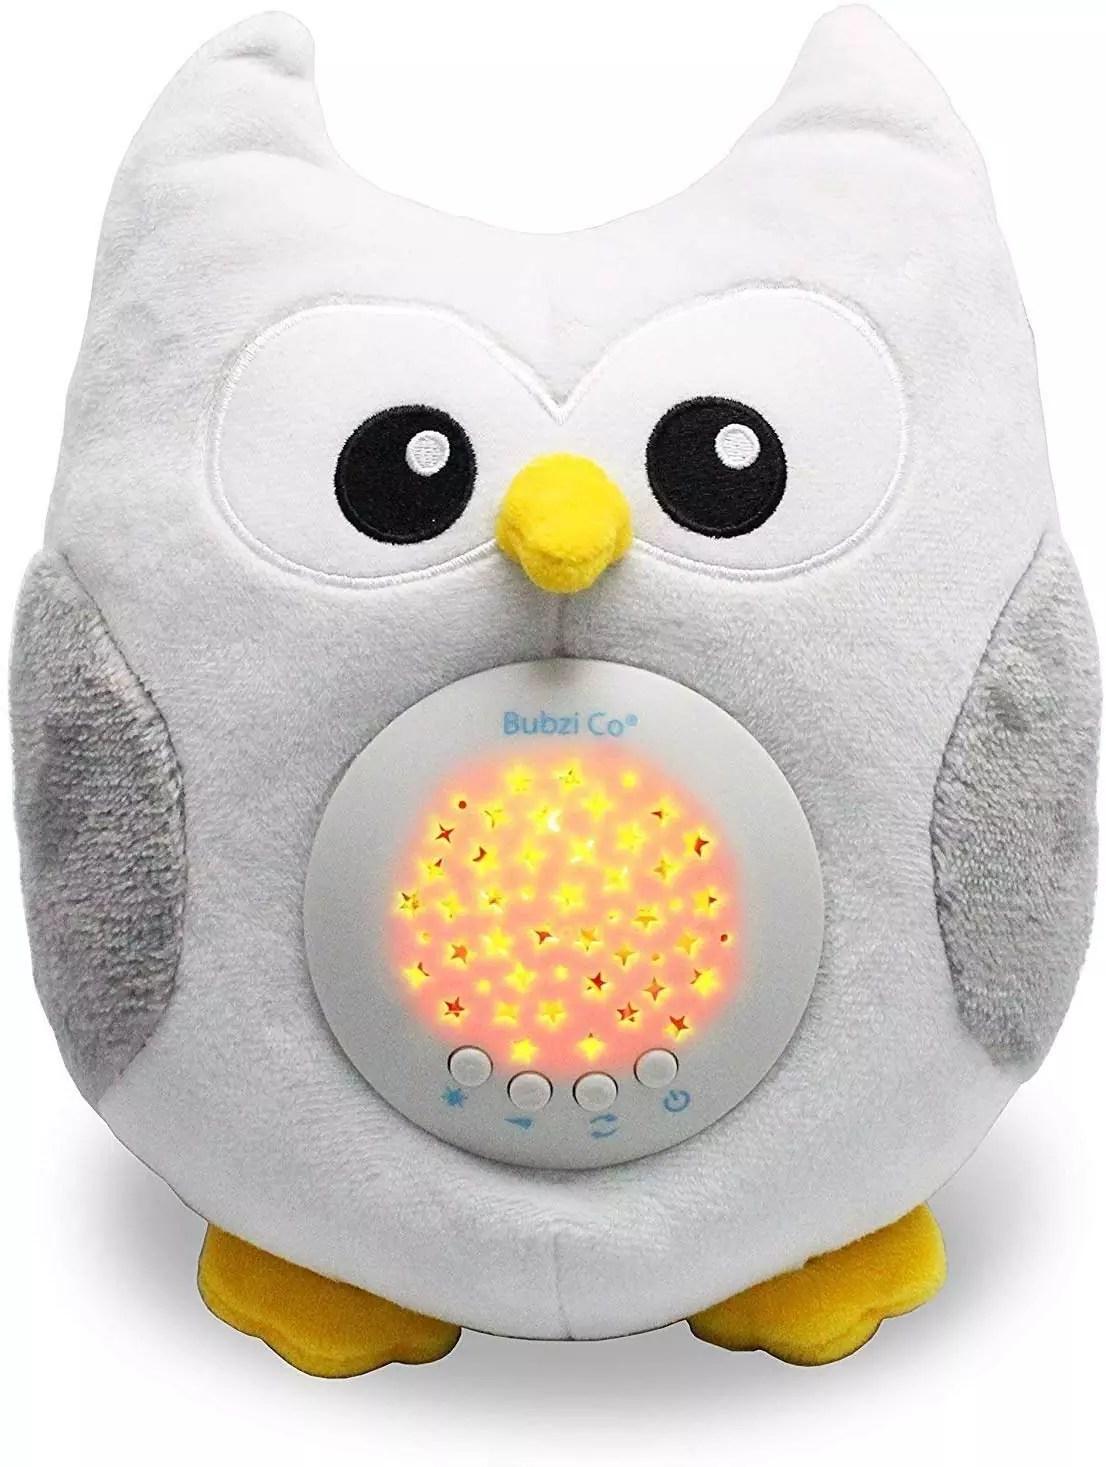 Baby Soother Toys Owl Sleep Aid Night Light